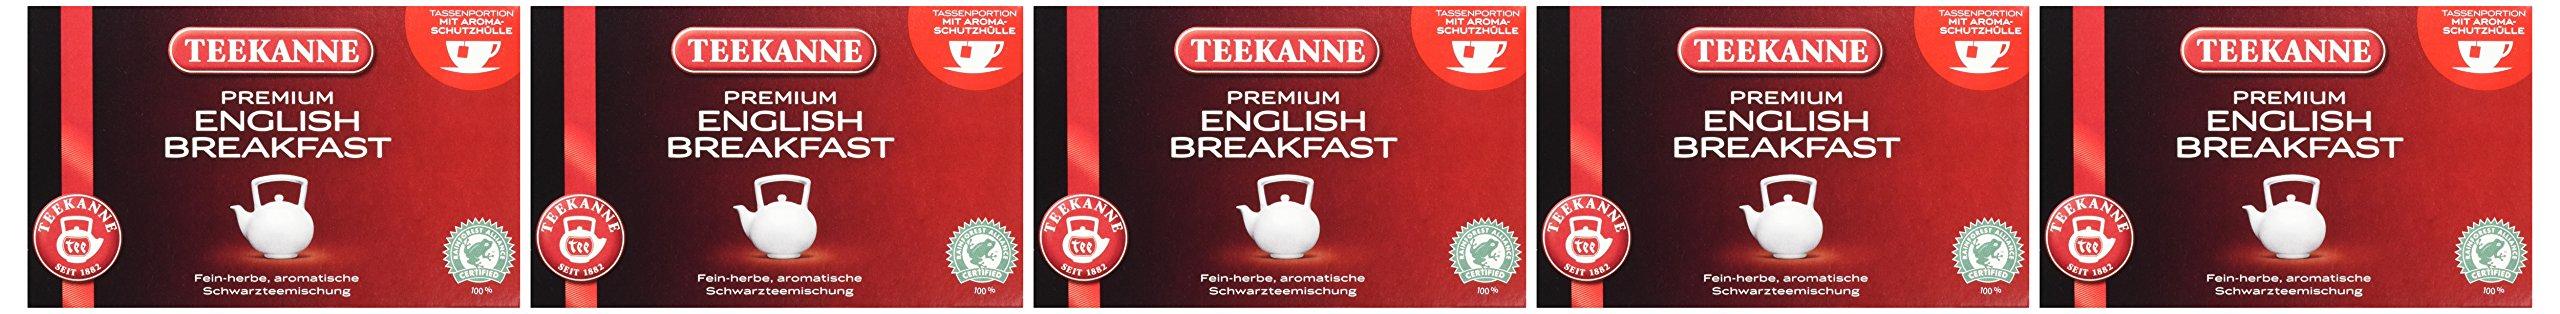 Teekanne-Premium-English-Breakfast-20-Beutel